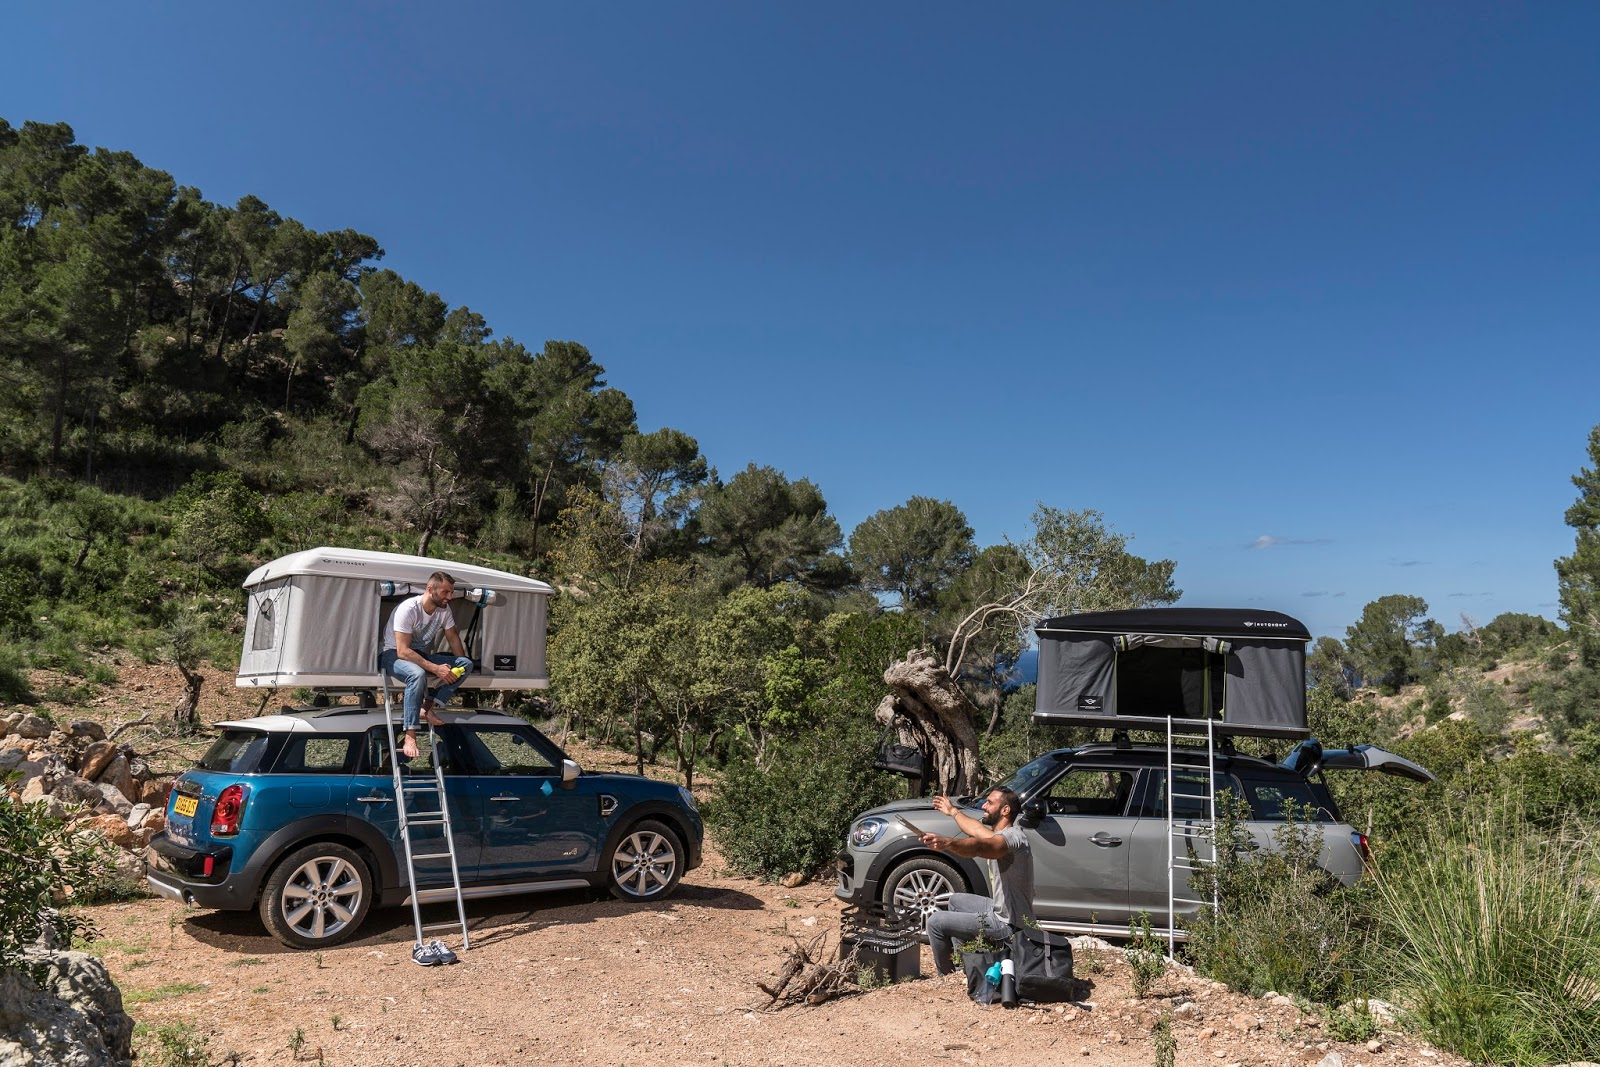 P90258011 highRes the autohome roof te Το MINI Countryman έχει και... σκηνή οροφής Mini, MINI Cooper Countryman, SUV